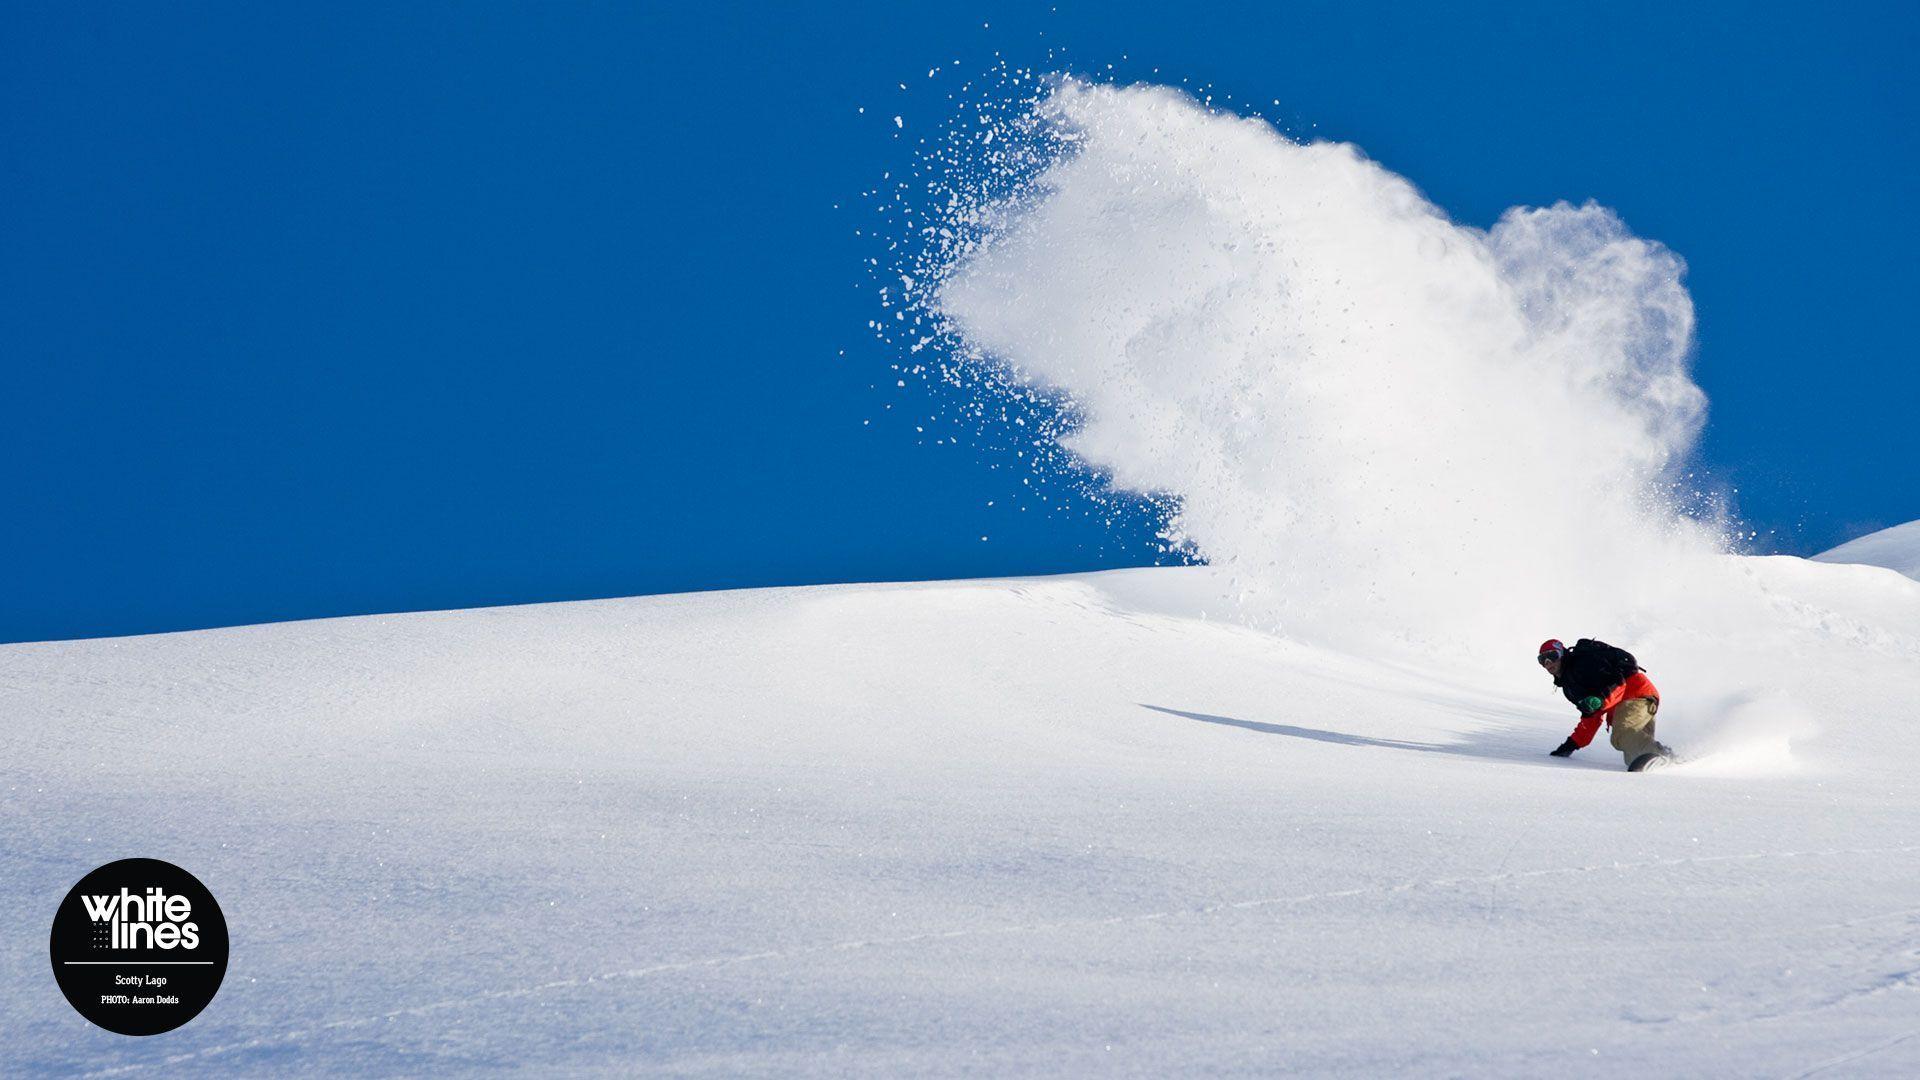 wallpapers whitelines snowboarding | snowboarding | pinterest